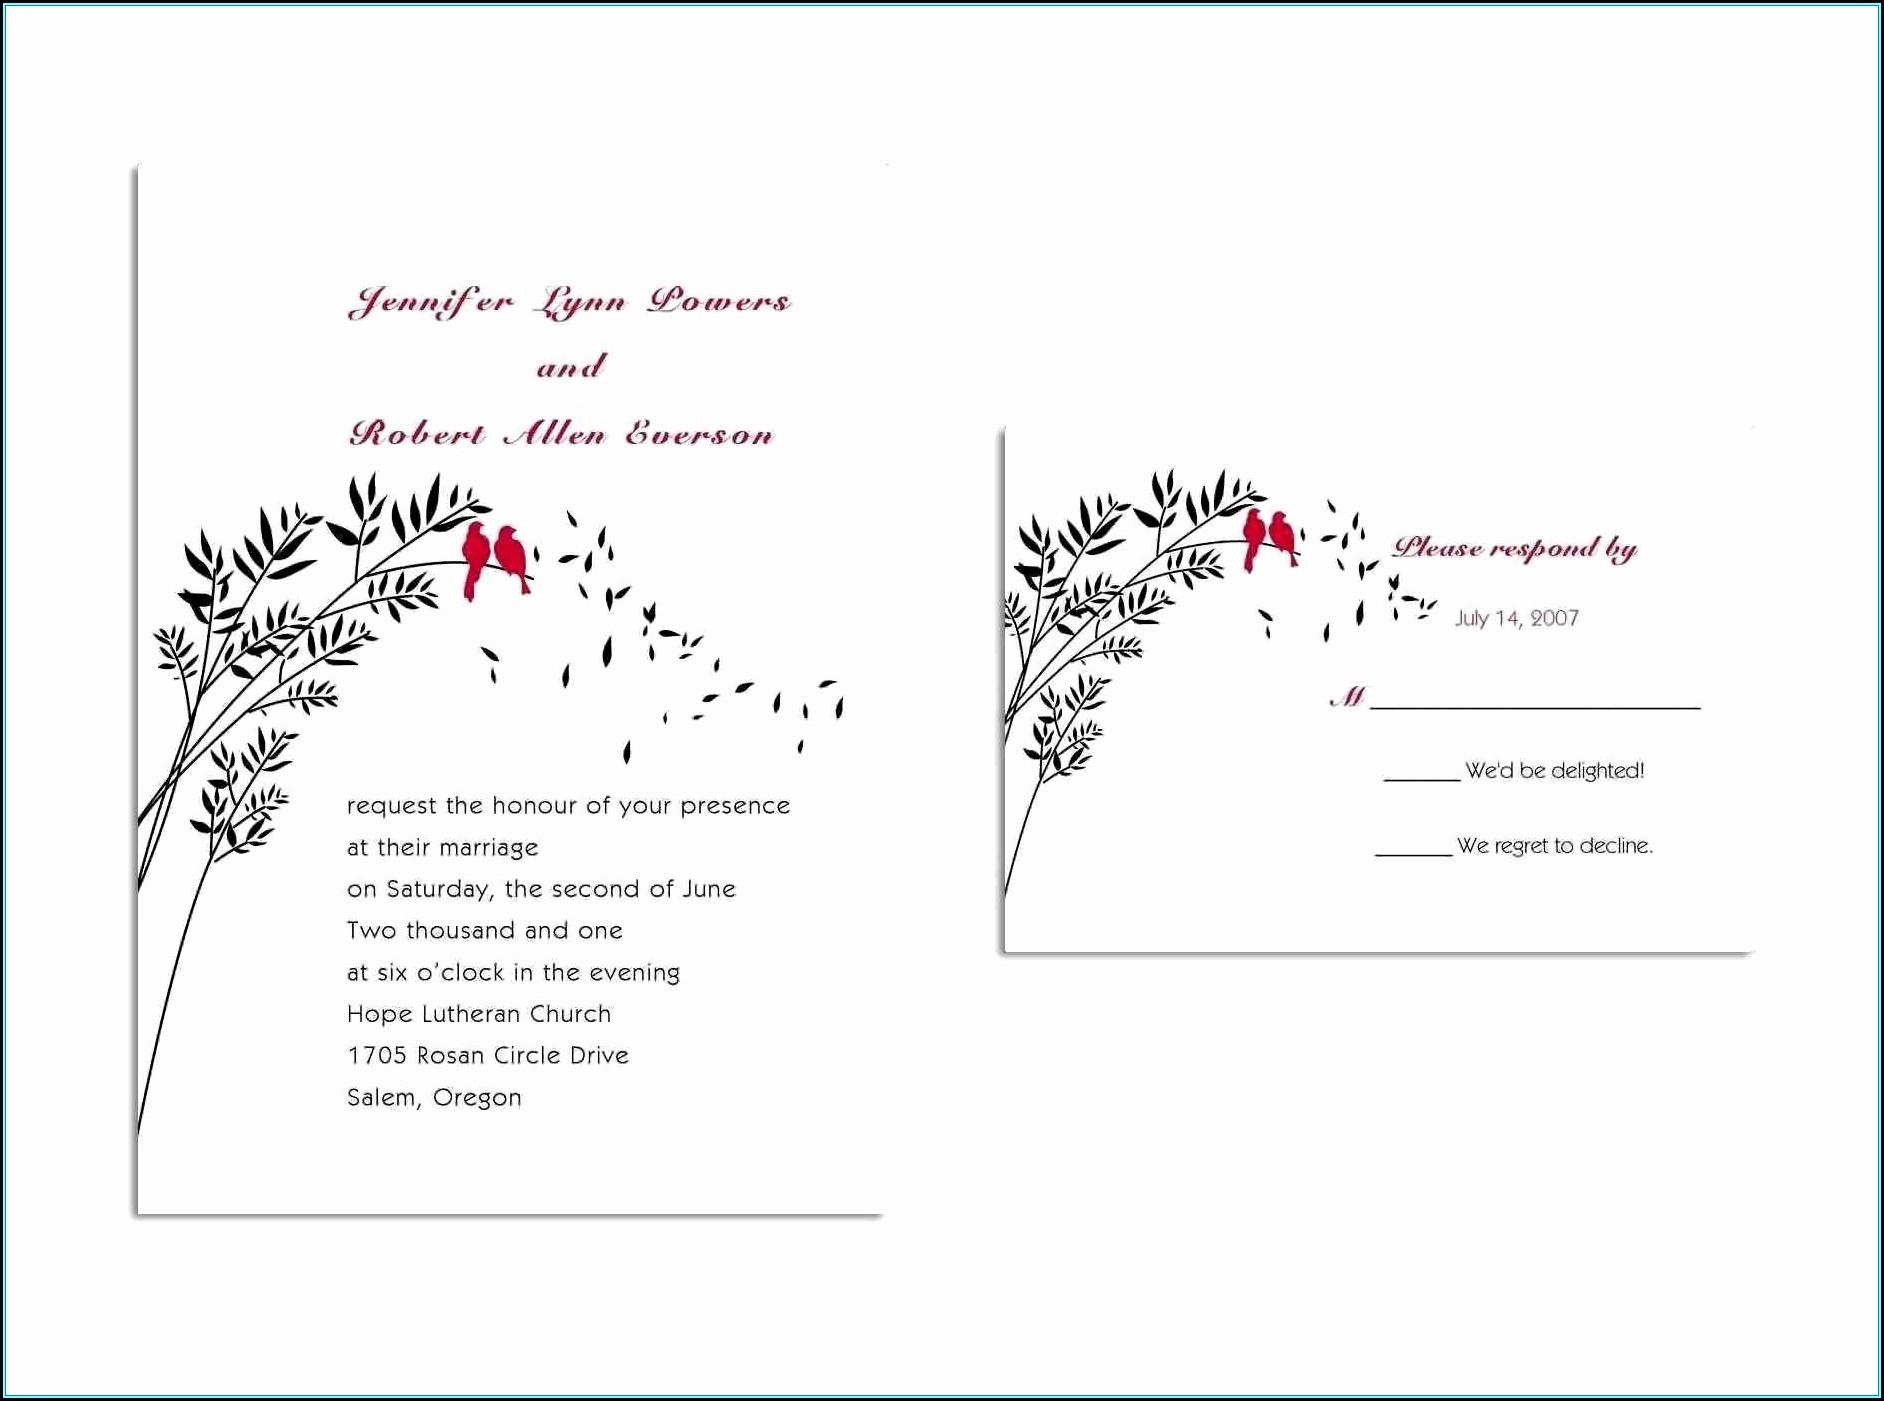 Qsl Card Design Template